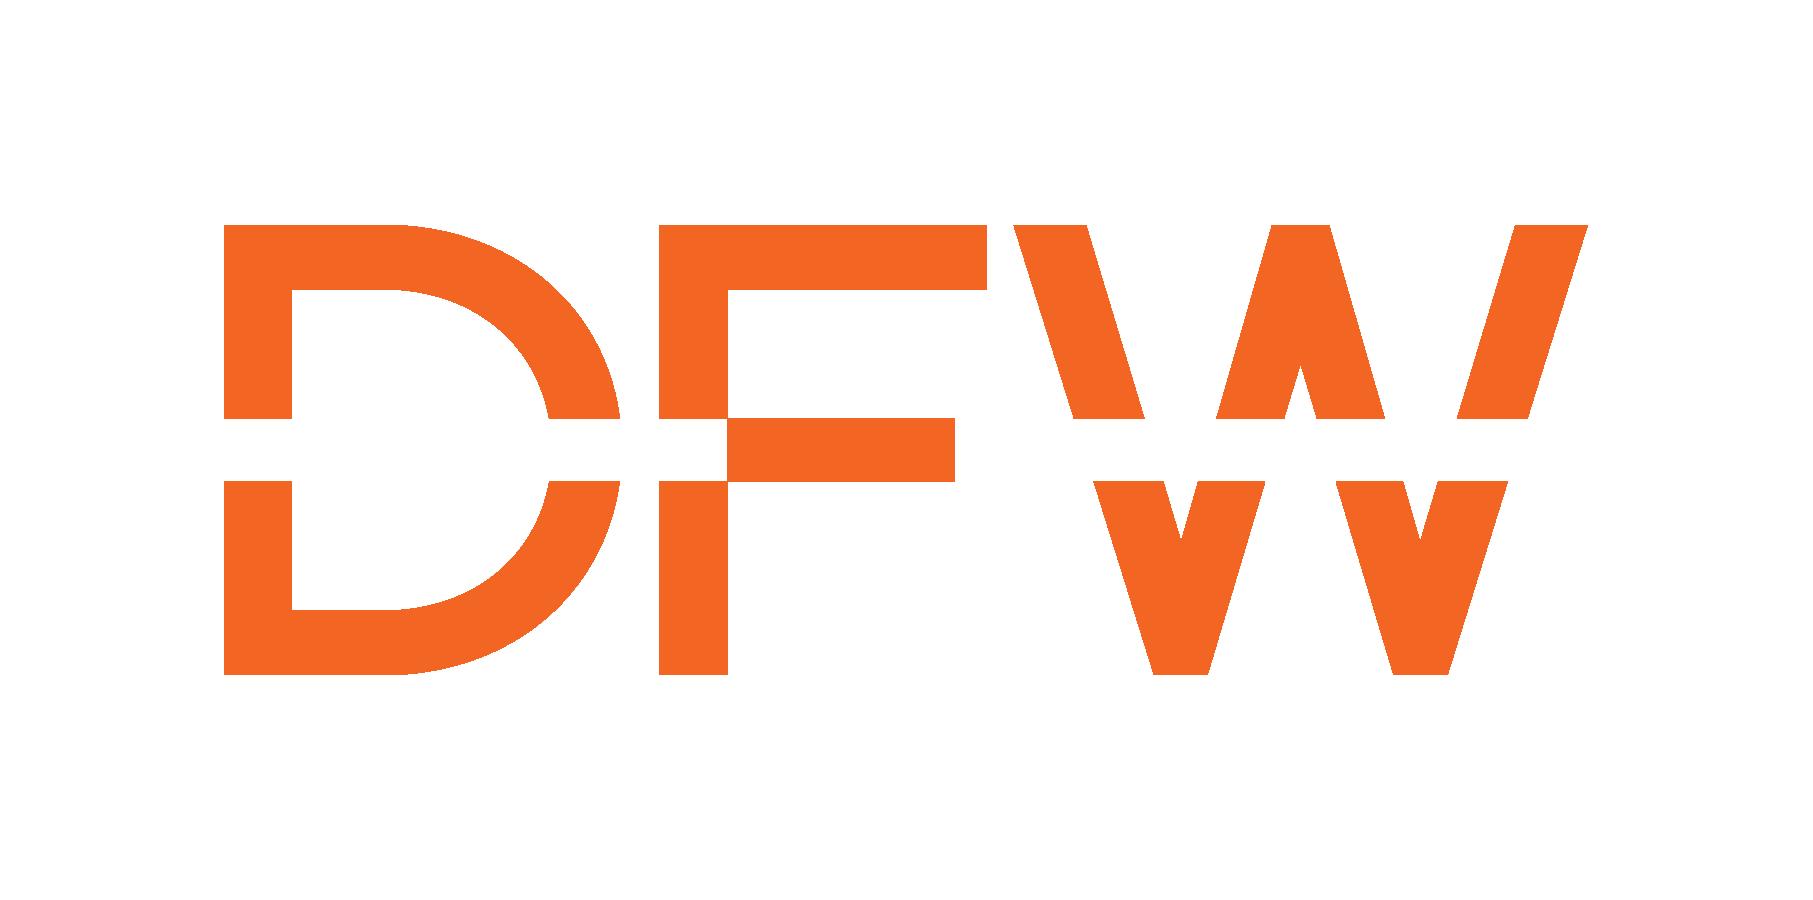 dfw_logo_300dpi_Orange_nobackground (2018_03_19 12_58_02 UTC).png